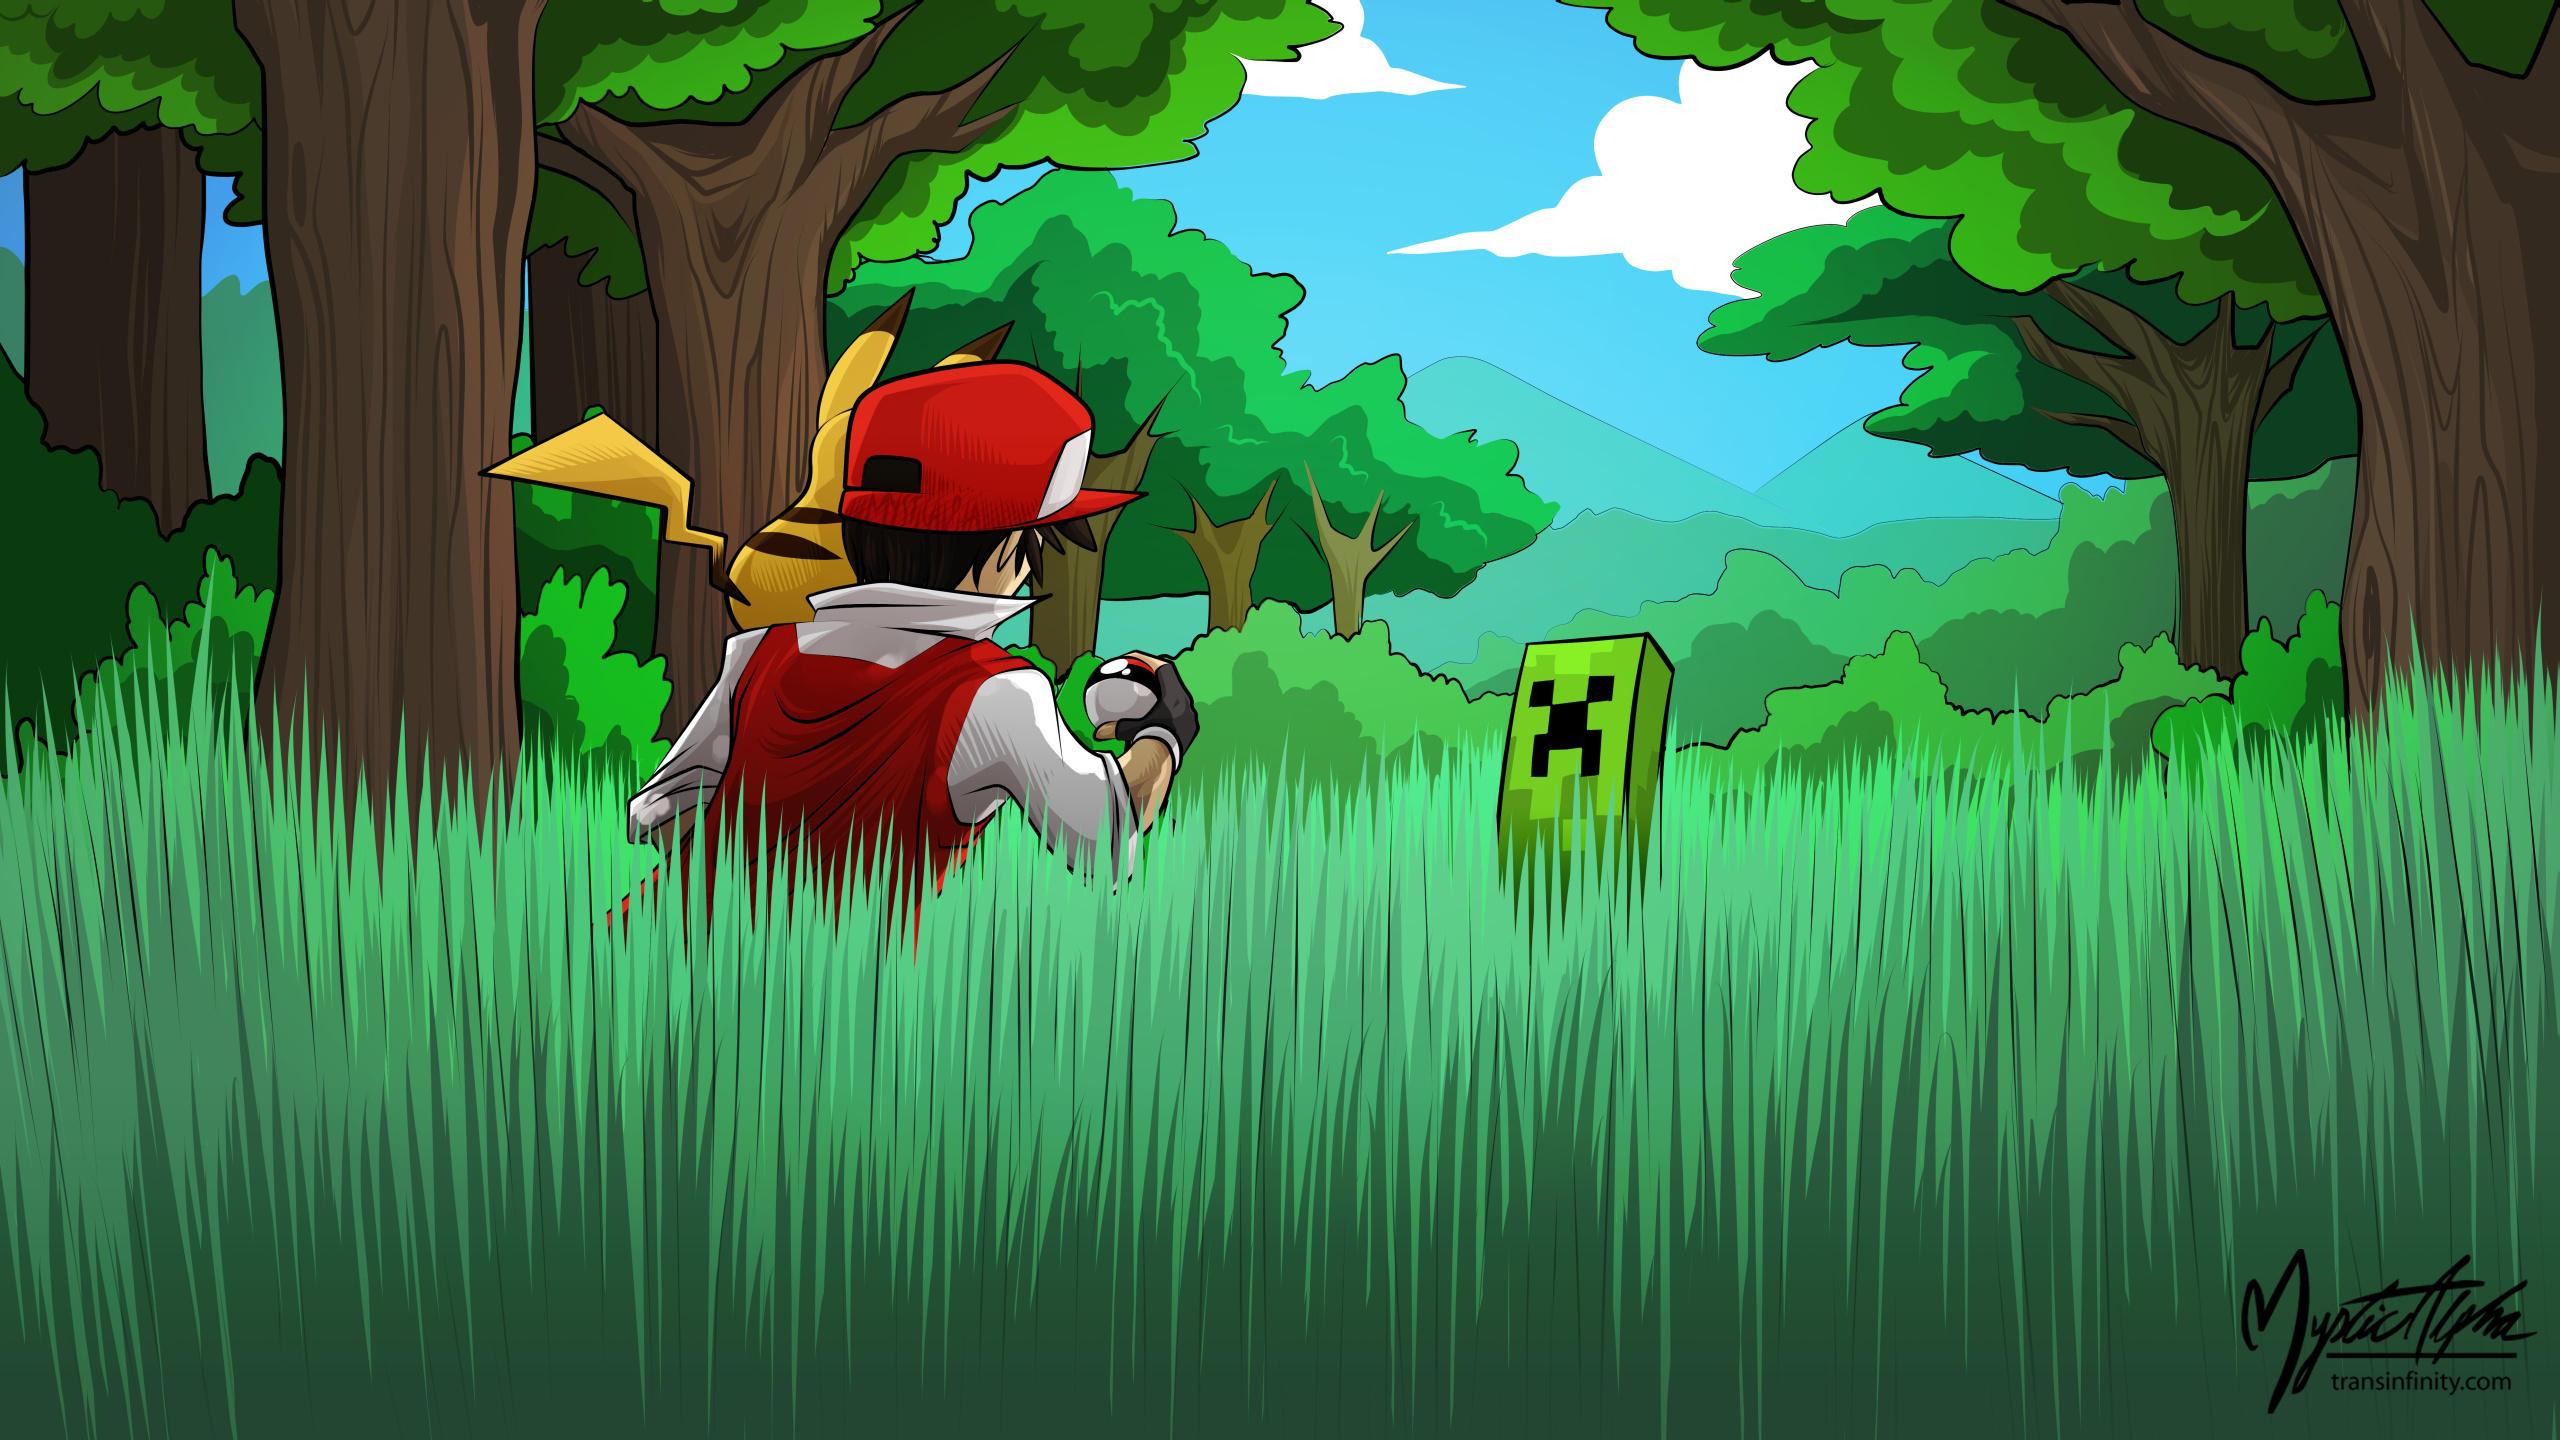 Pokemon Red vs. Creeper 16:9 by mysticalpha